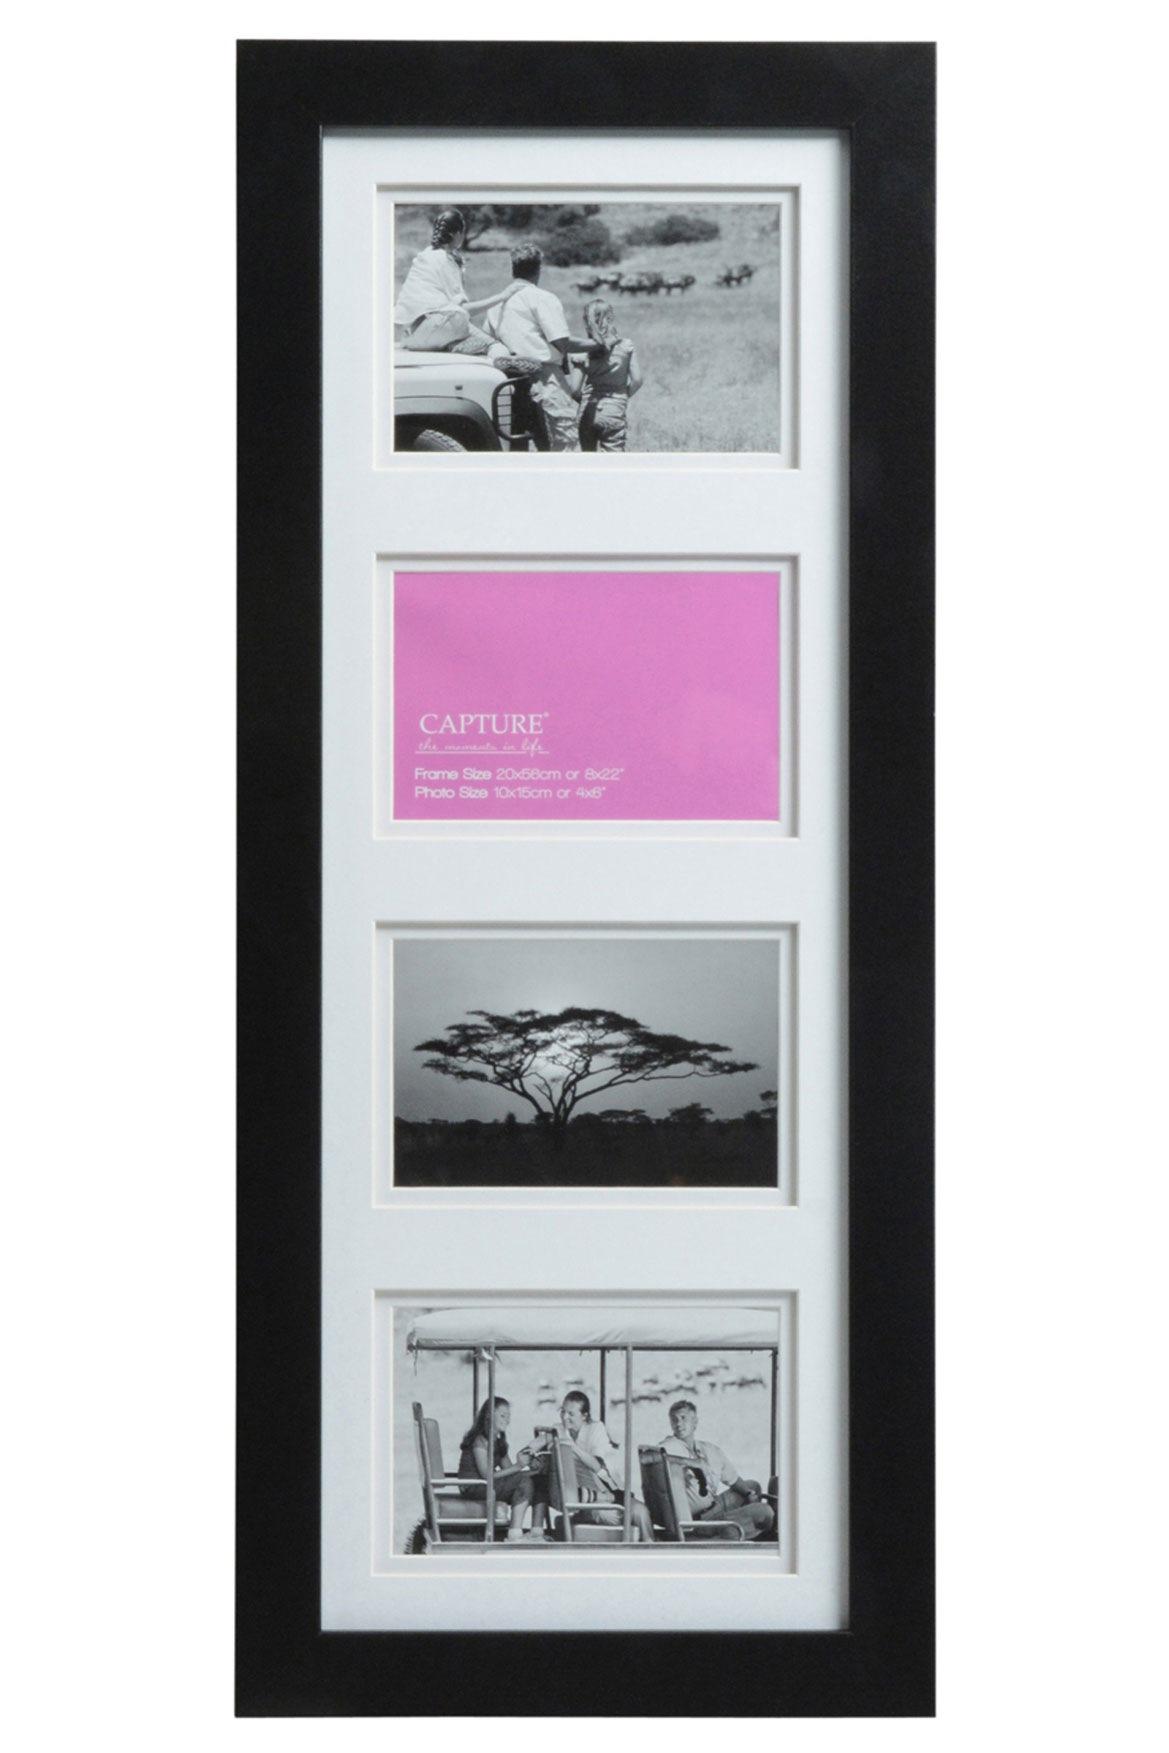 Capture Venture Frame 10x15cm Myer Online